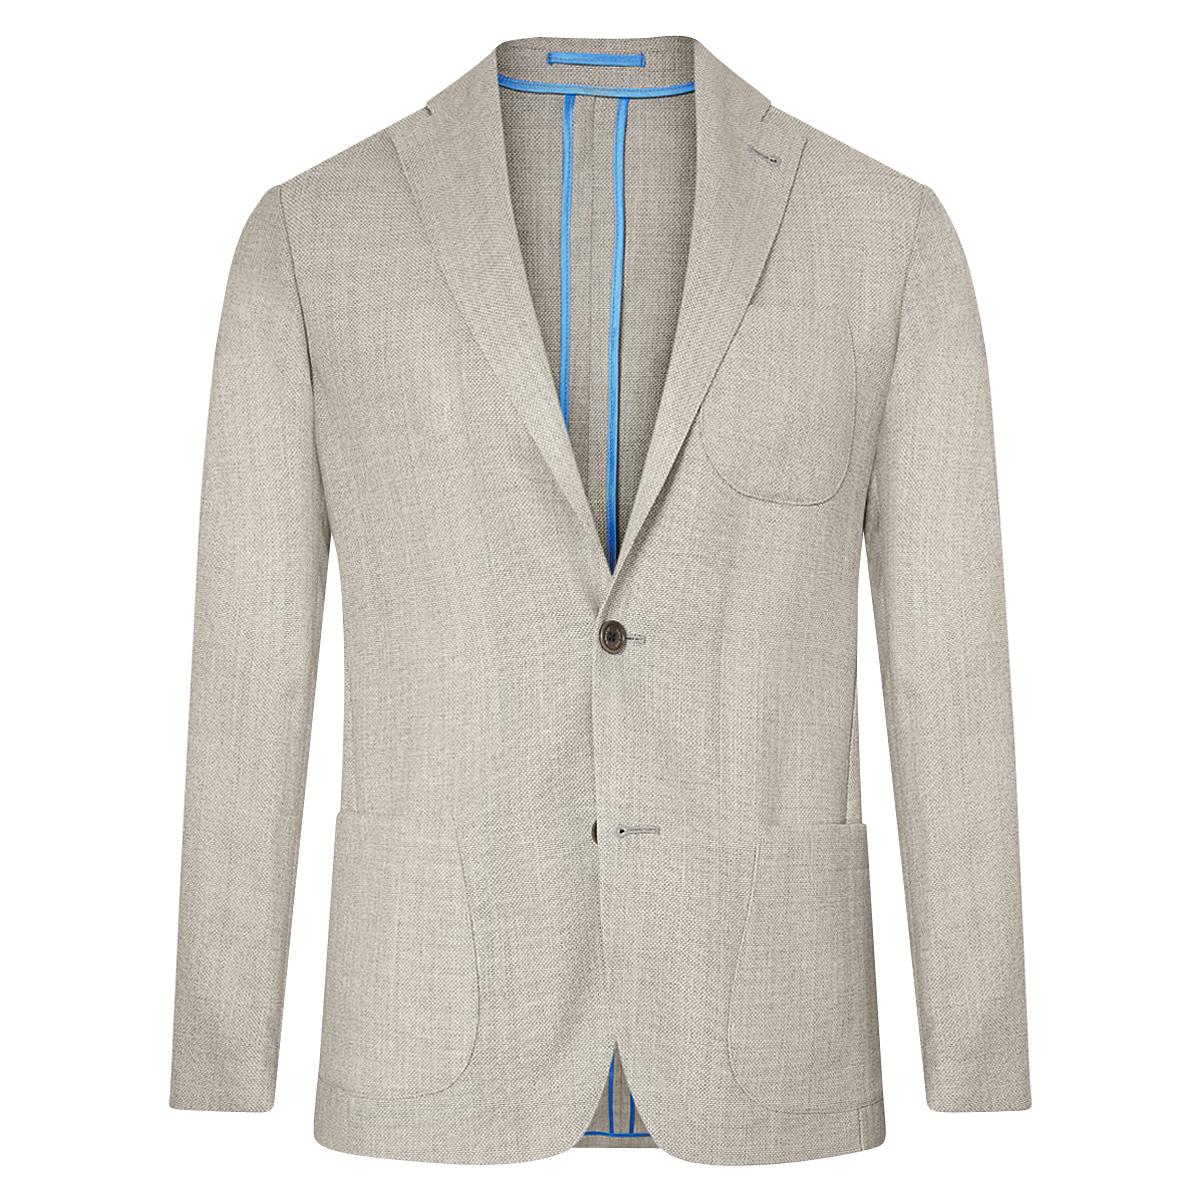 Light Grey Unlined Single-Breasted Patch Pocket Jacket